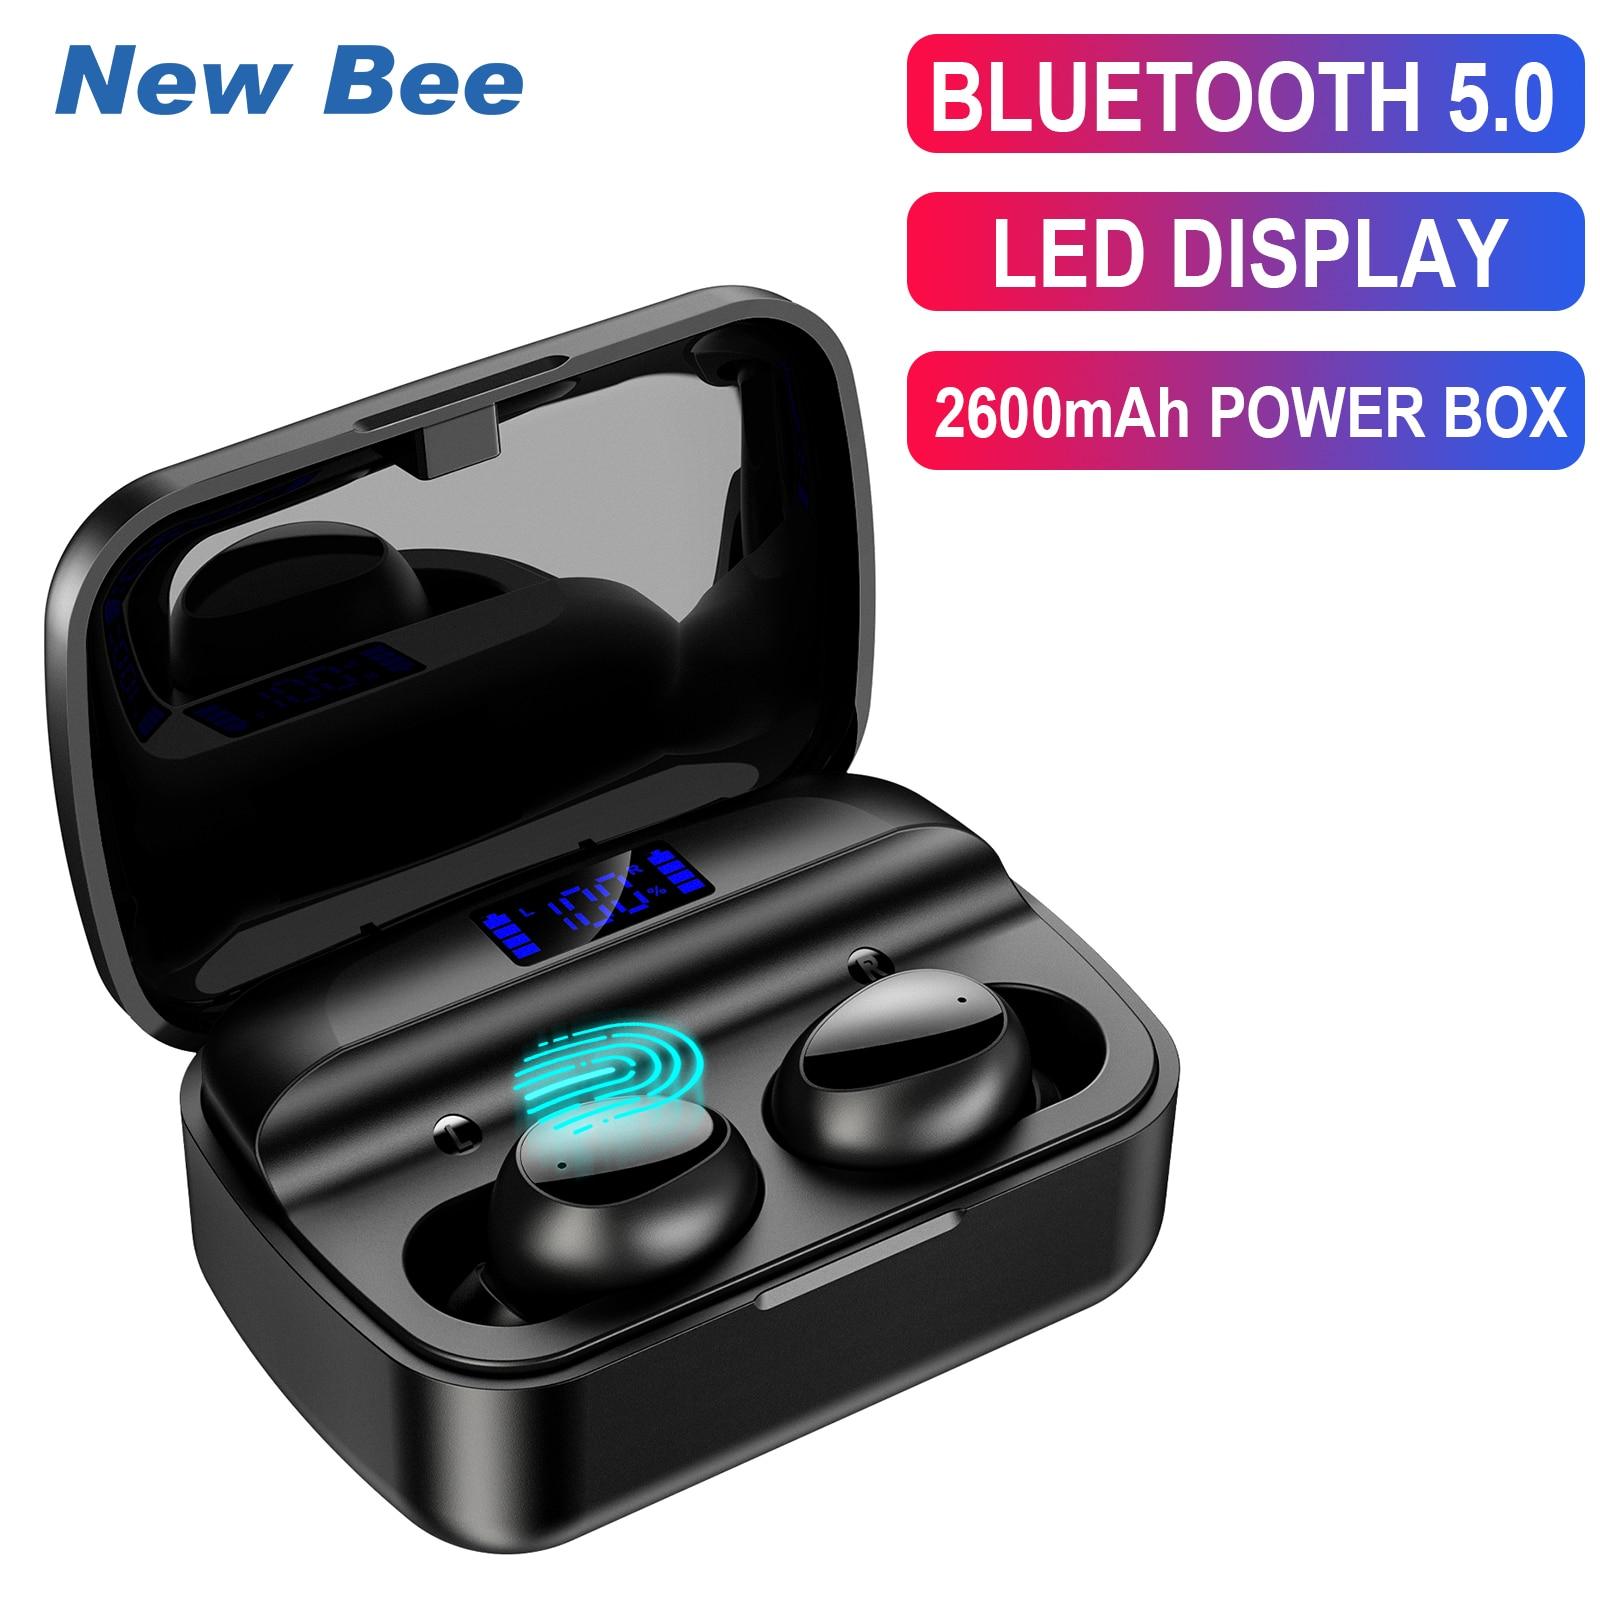 TWS-Наушники New Bee с поддержкой Bluetooth 5,0 и микрофоном, 2600 мА · ч